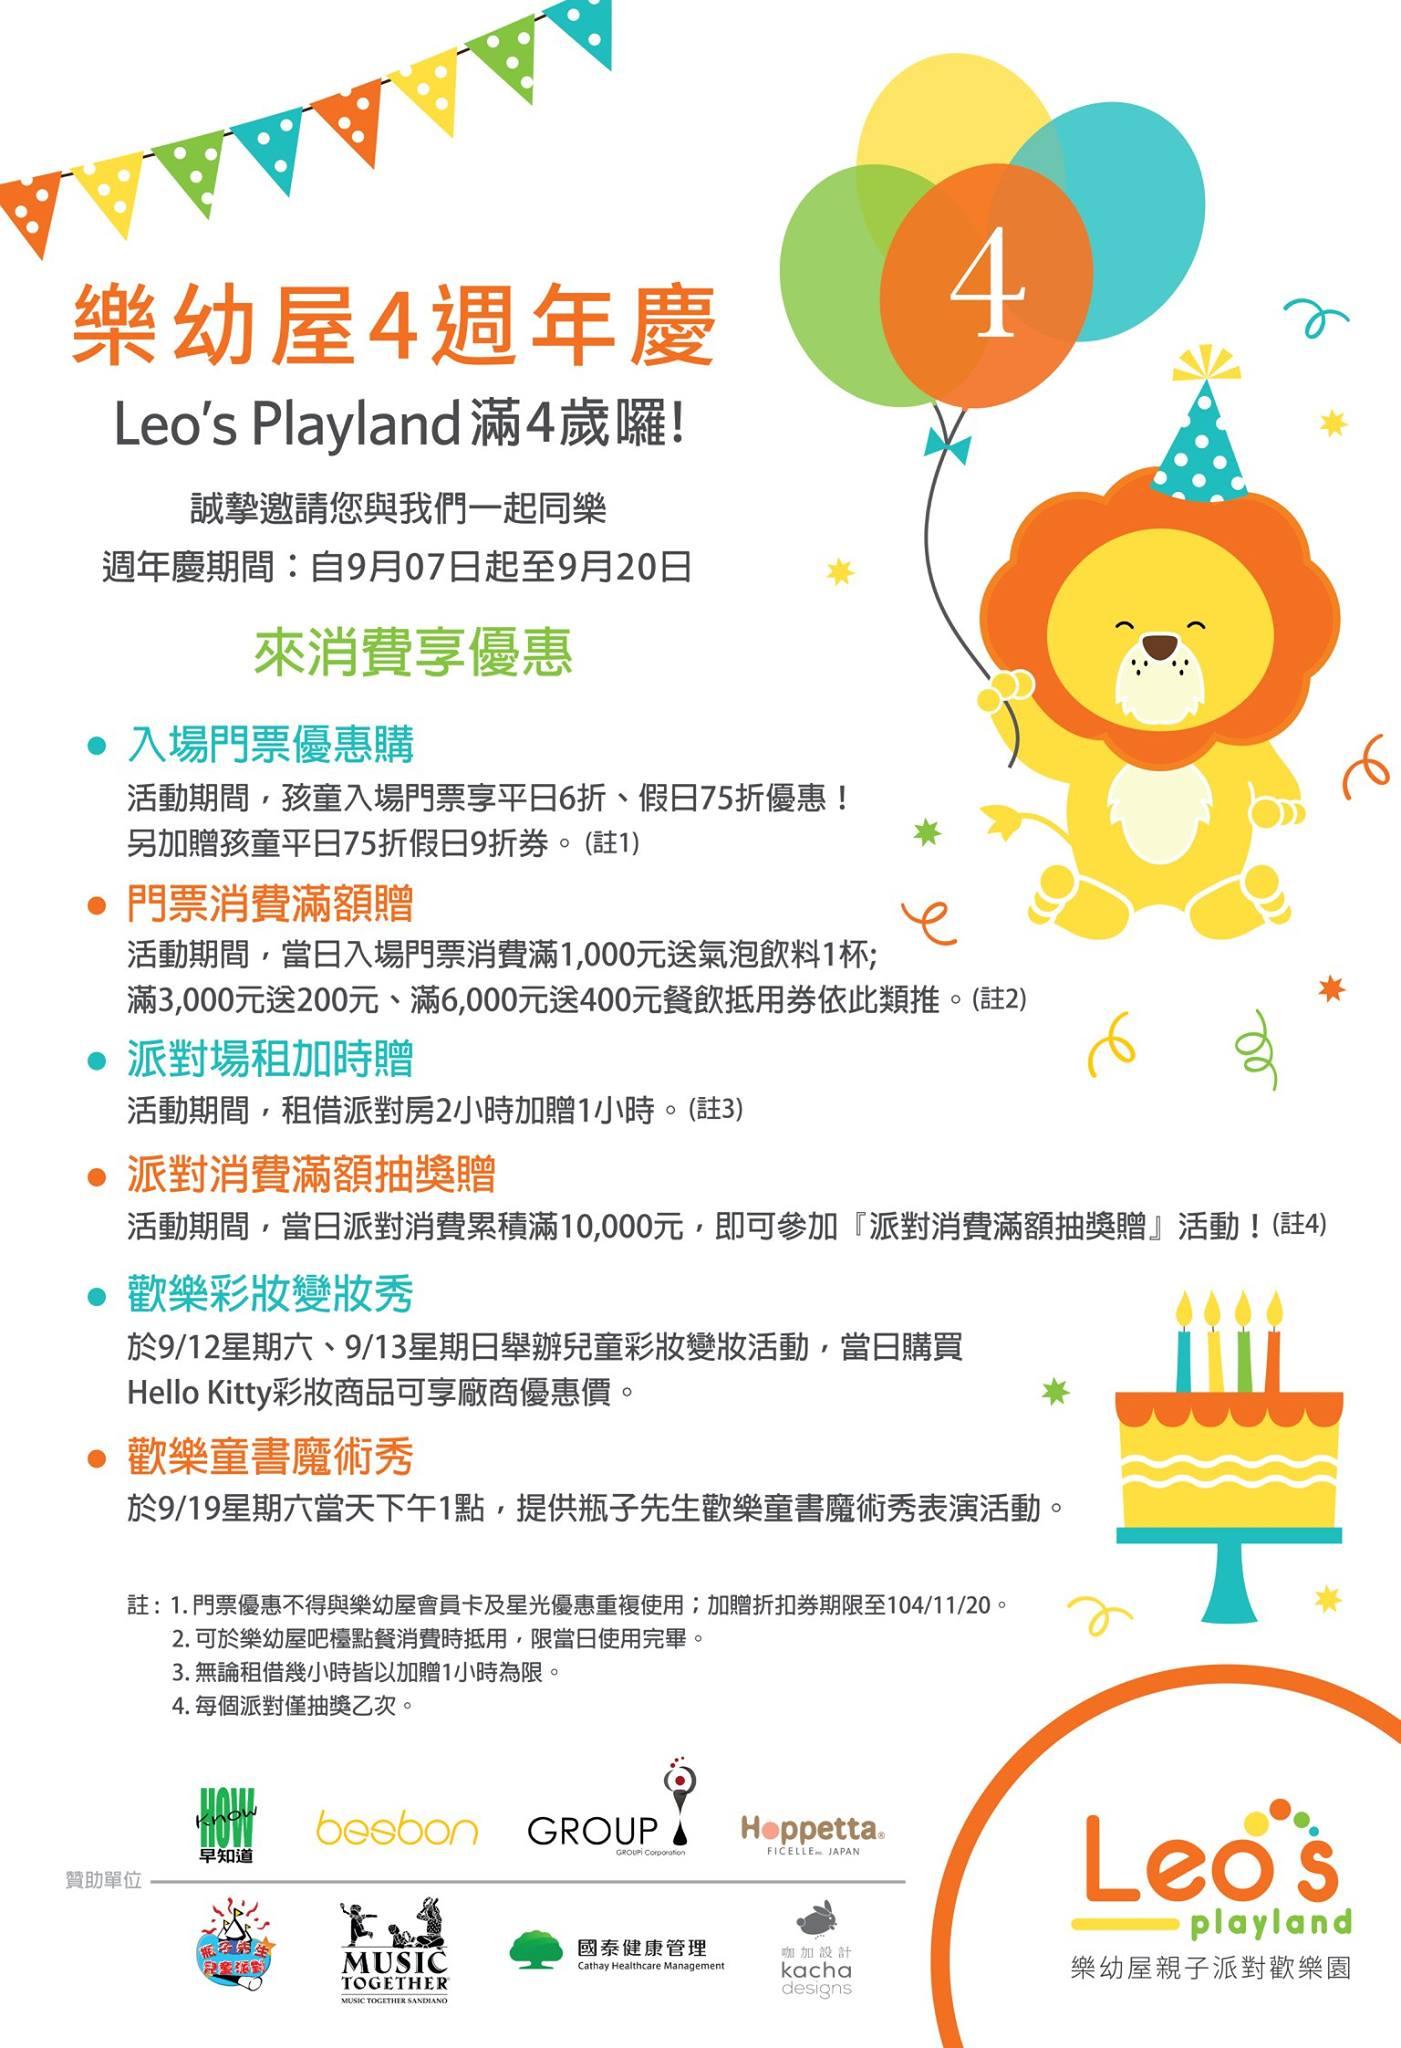 2015 Anniversary Promotion